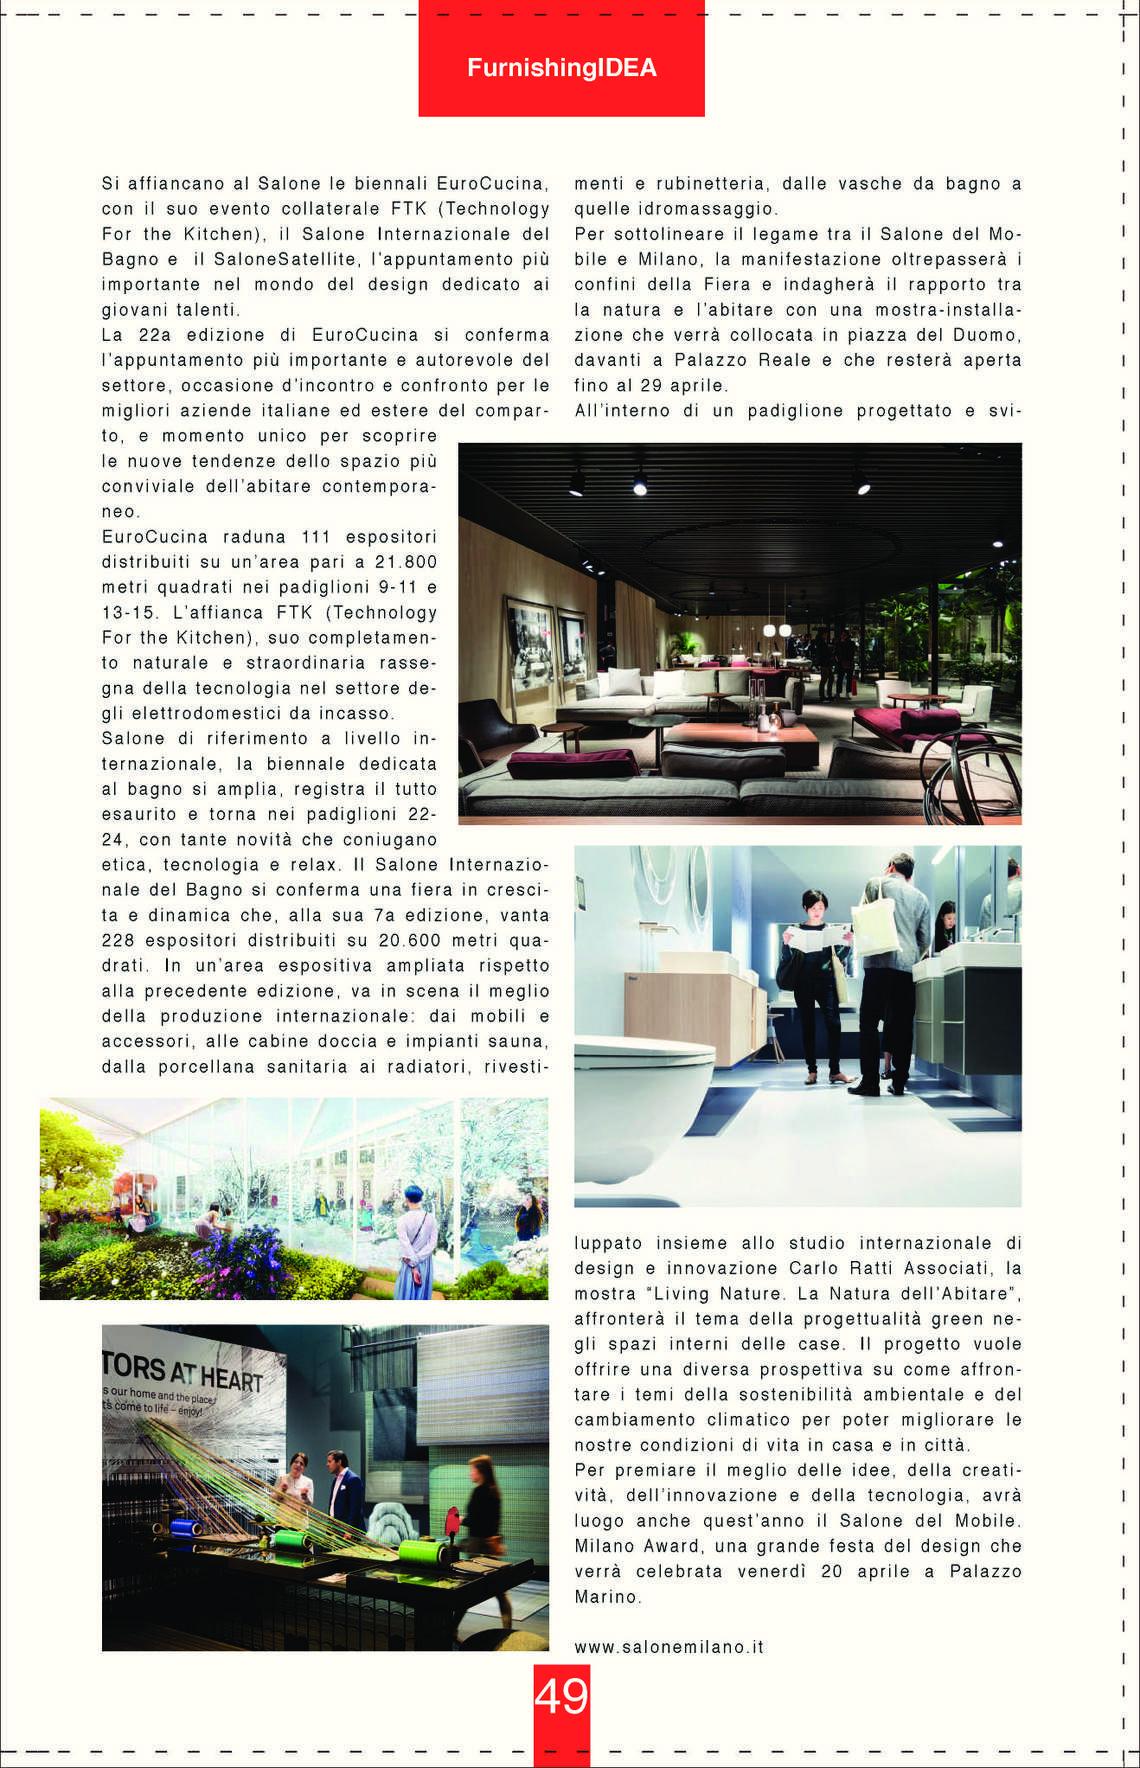 furnishing-idea-journal--1-2018_journal_9_048.jpg